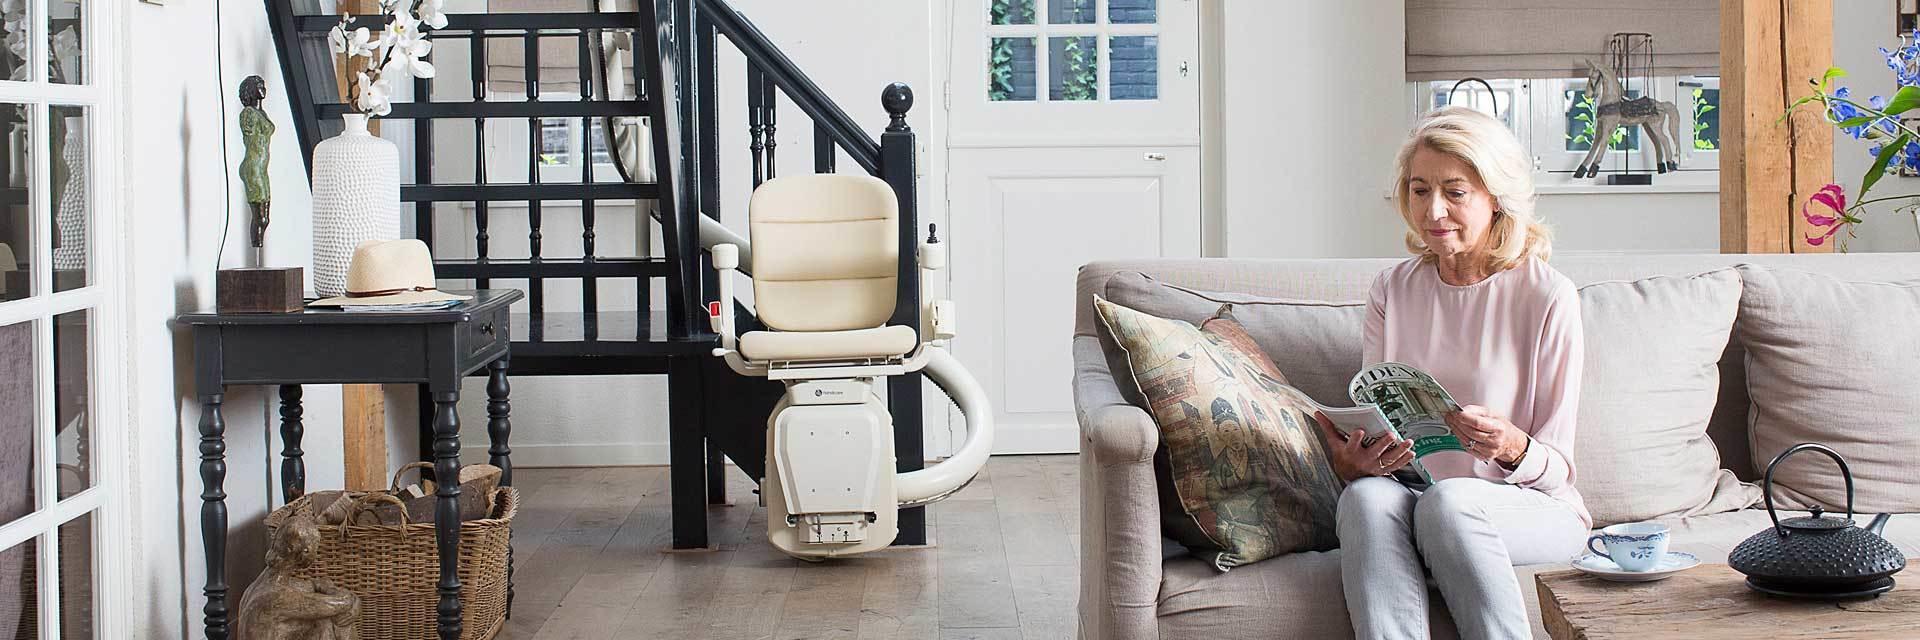 Handicare San Jose Kraus Curved FreeCurve 2000 stair chair Oakland ca Lift